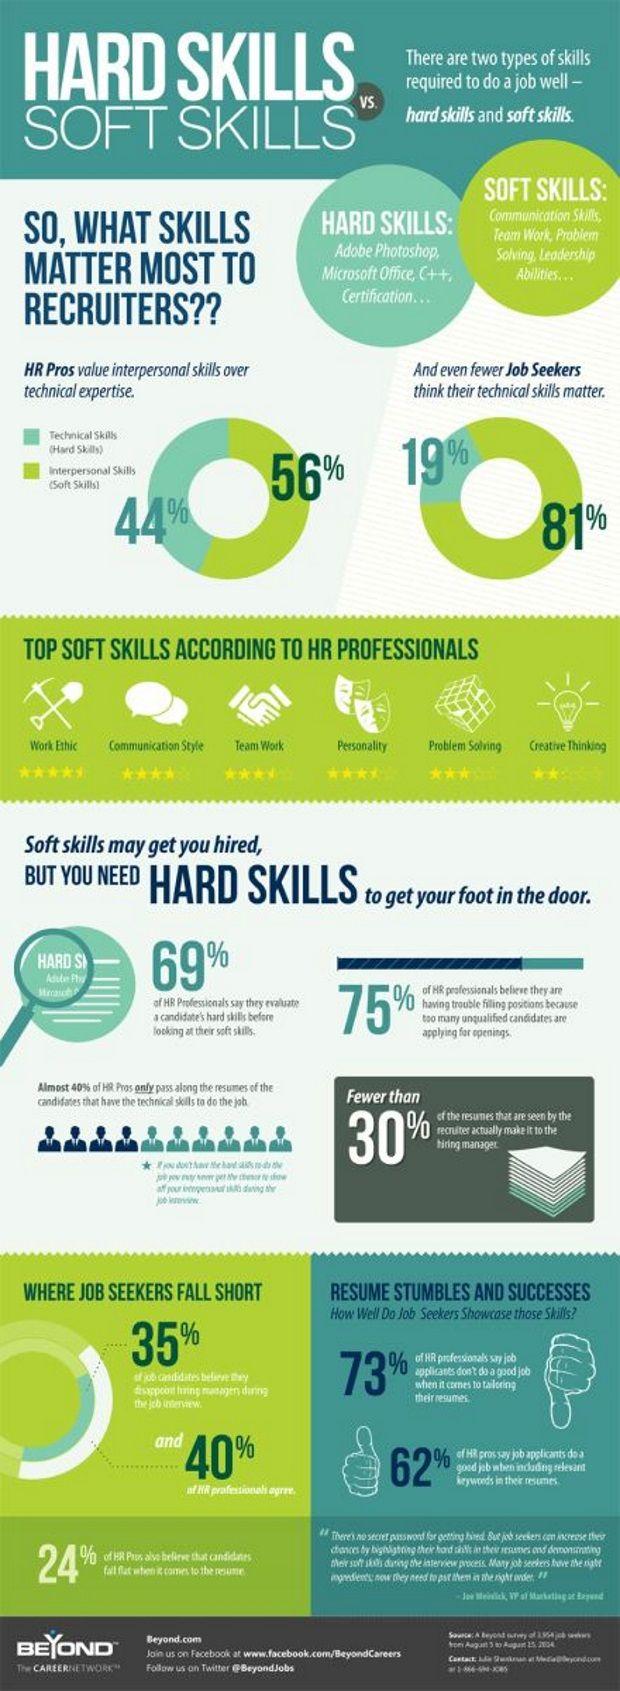 Resume Job Career Job Seeker Job Search Tips